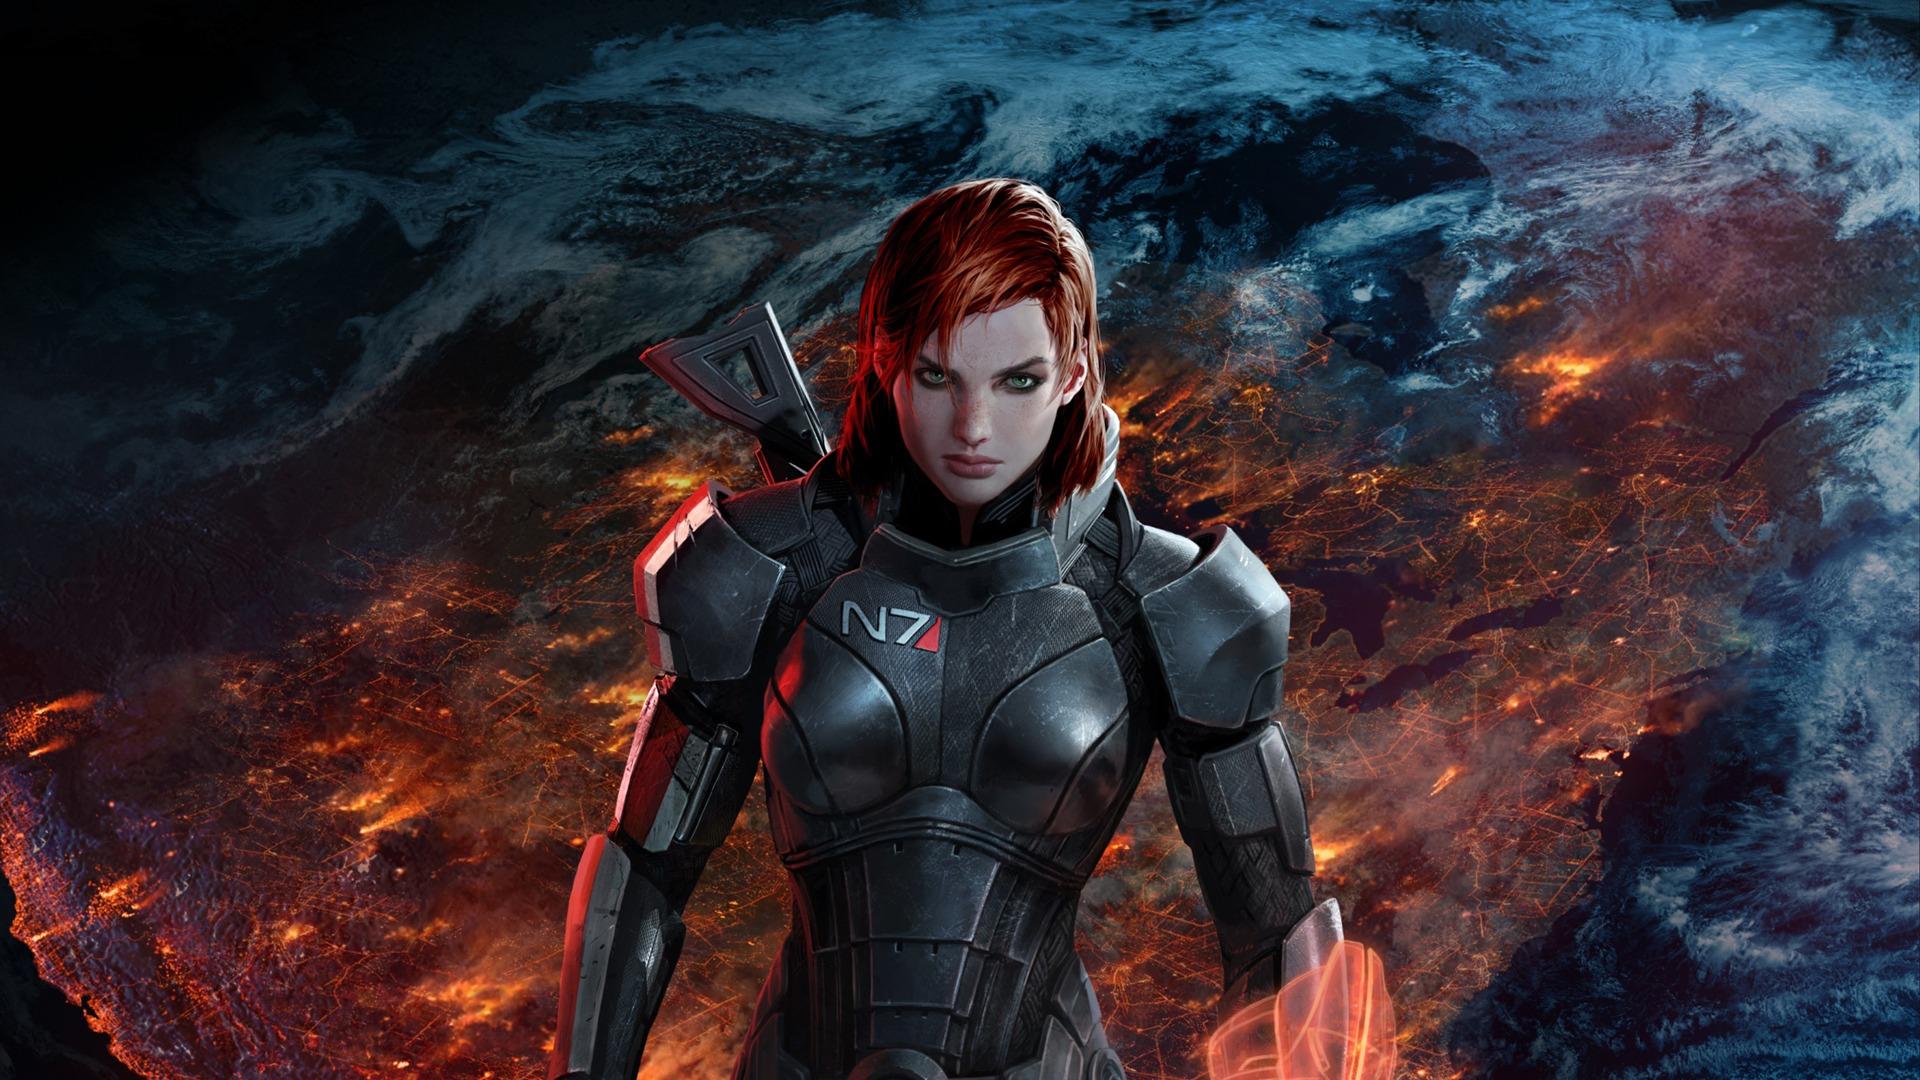 Mass Effect Andromeda 2017 Game Wallpaper 03 Preview 10wallpaper Com